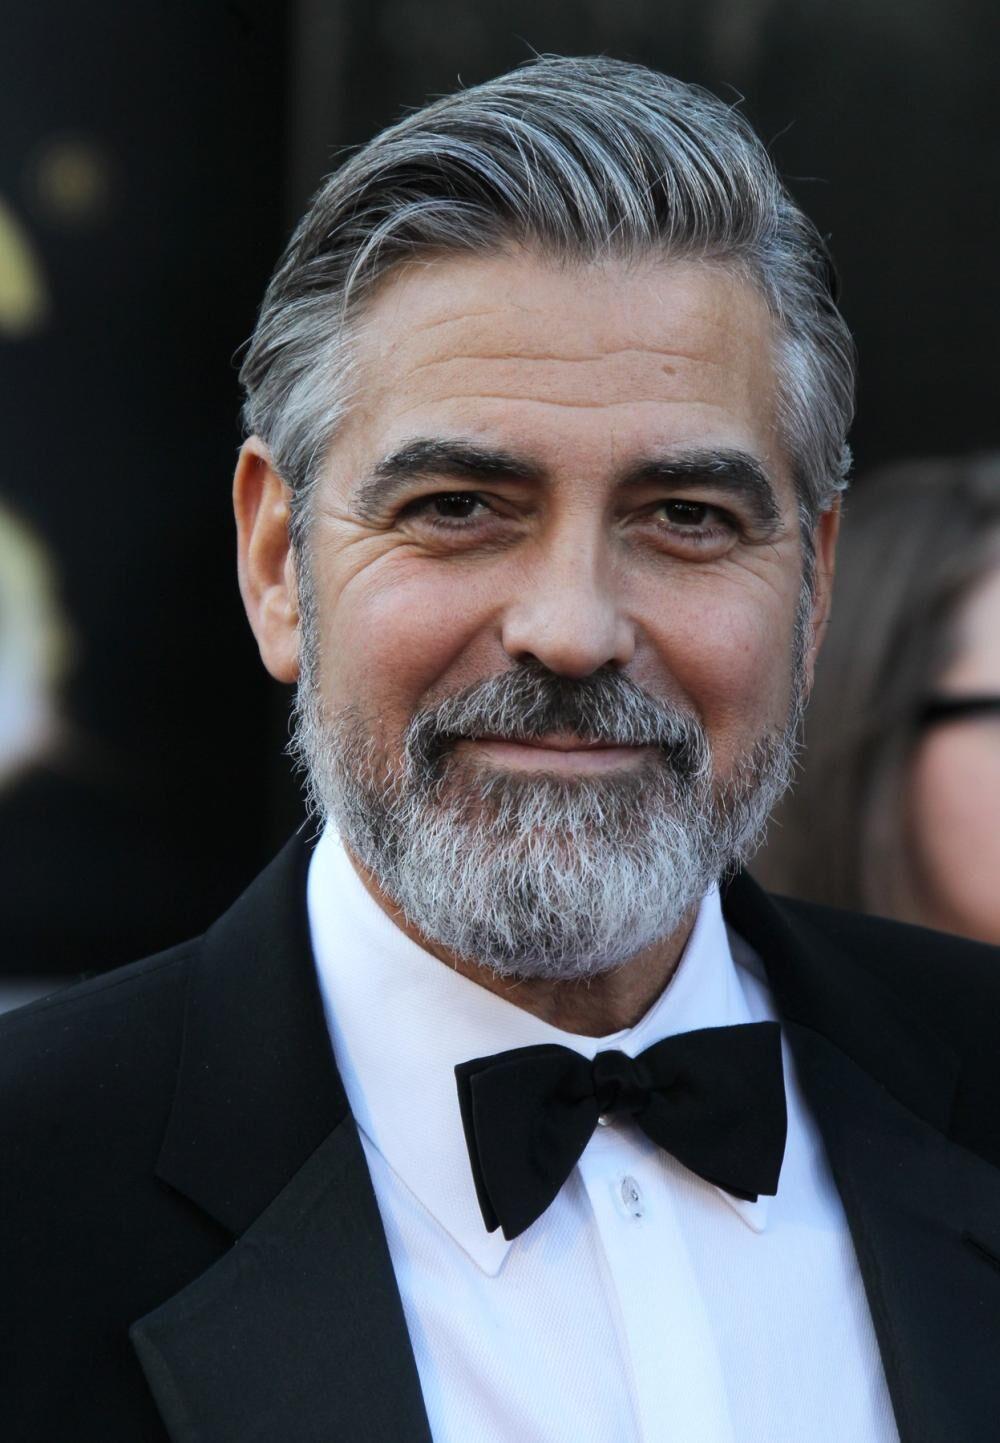 Goeorge Clooney